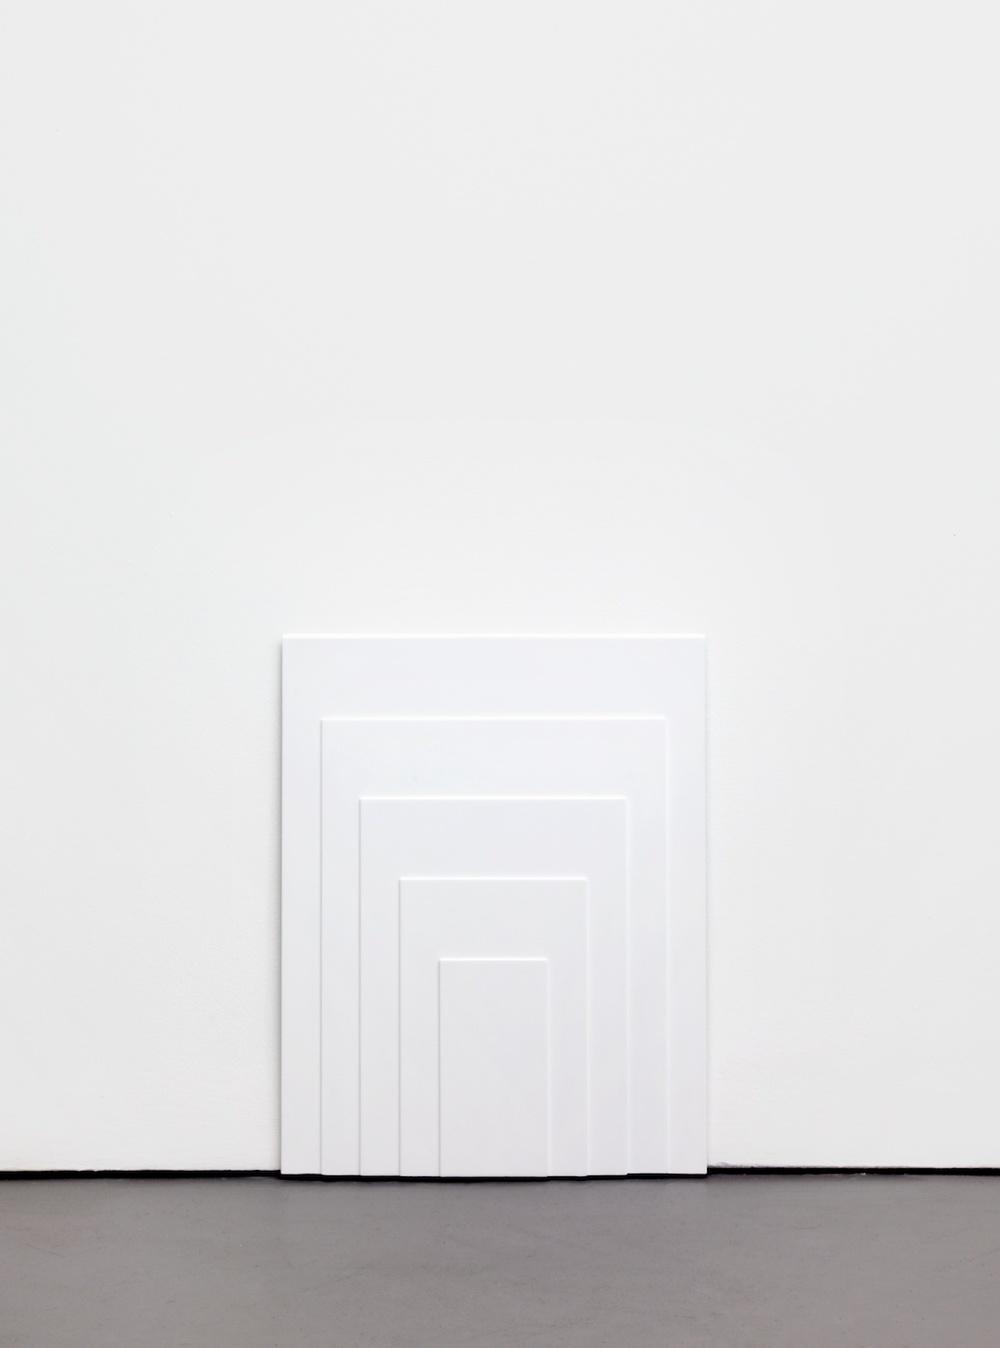 Lisa Williamson  Low Doorways  2011 Acrylic on steel 20 ½h x 16w in LW083